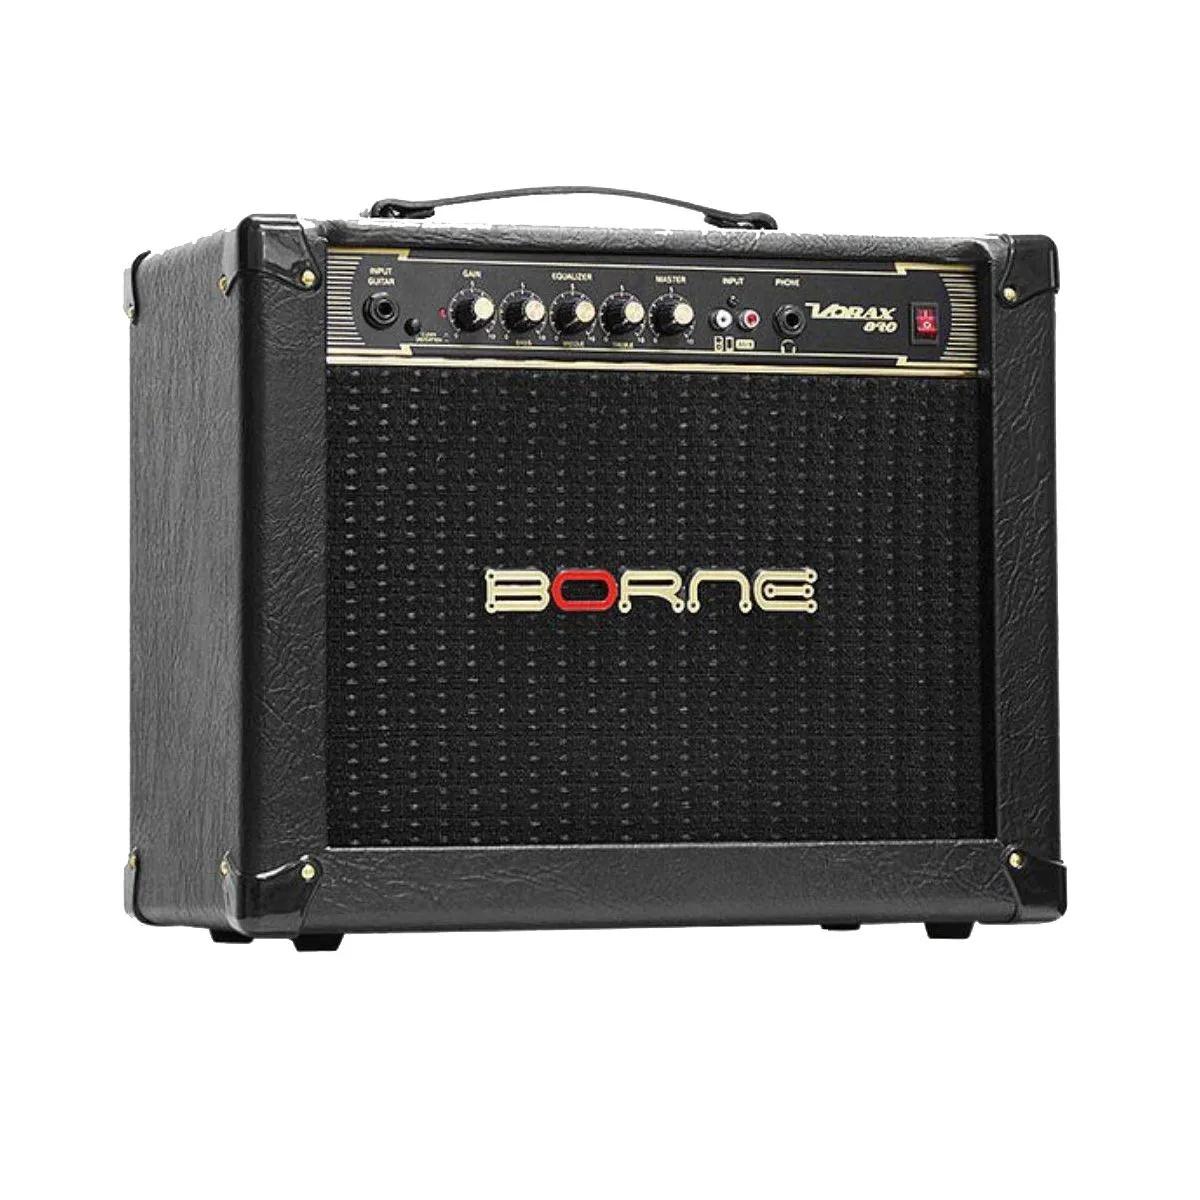 Caixa Amplificada Borne Vorax 840 1x8 40w RMS para Guitarra